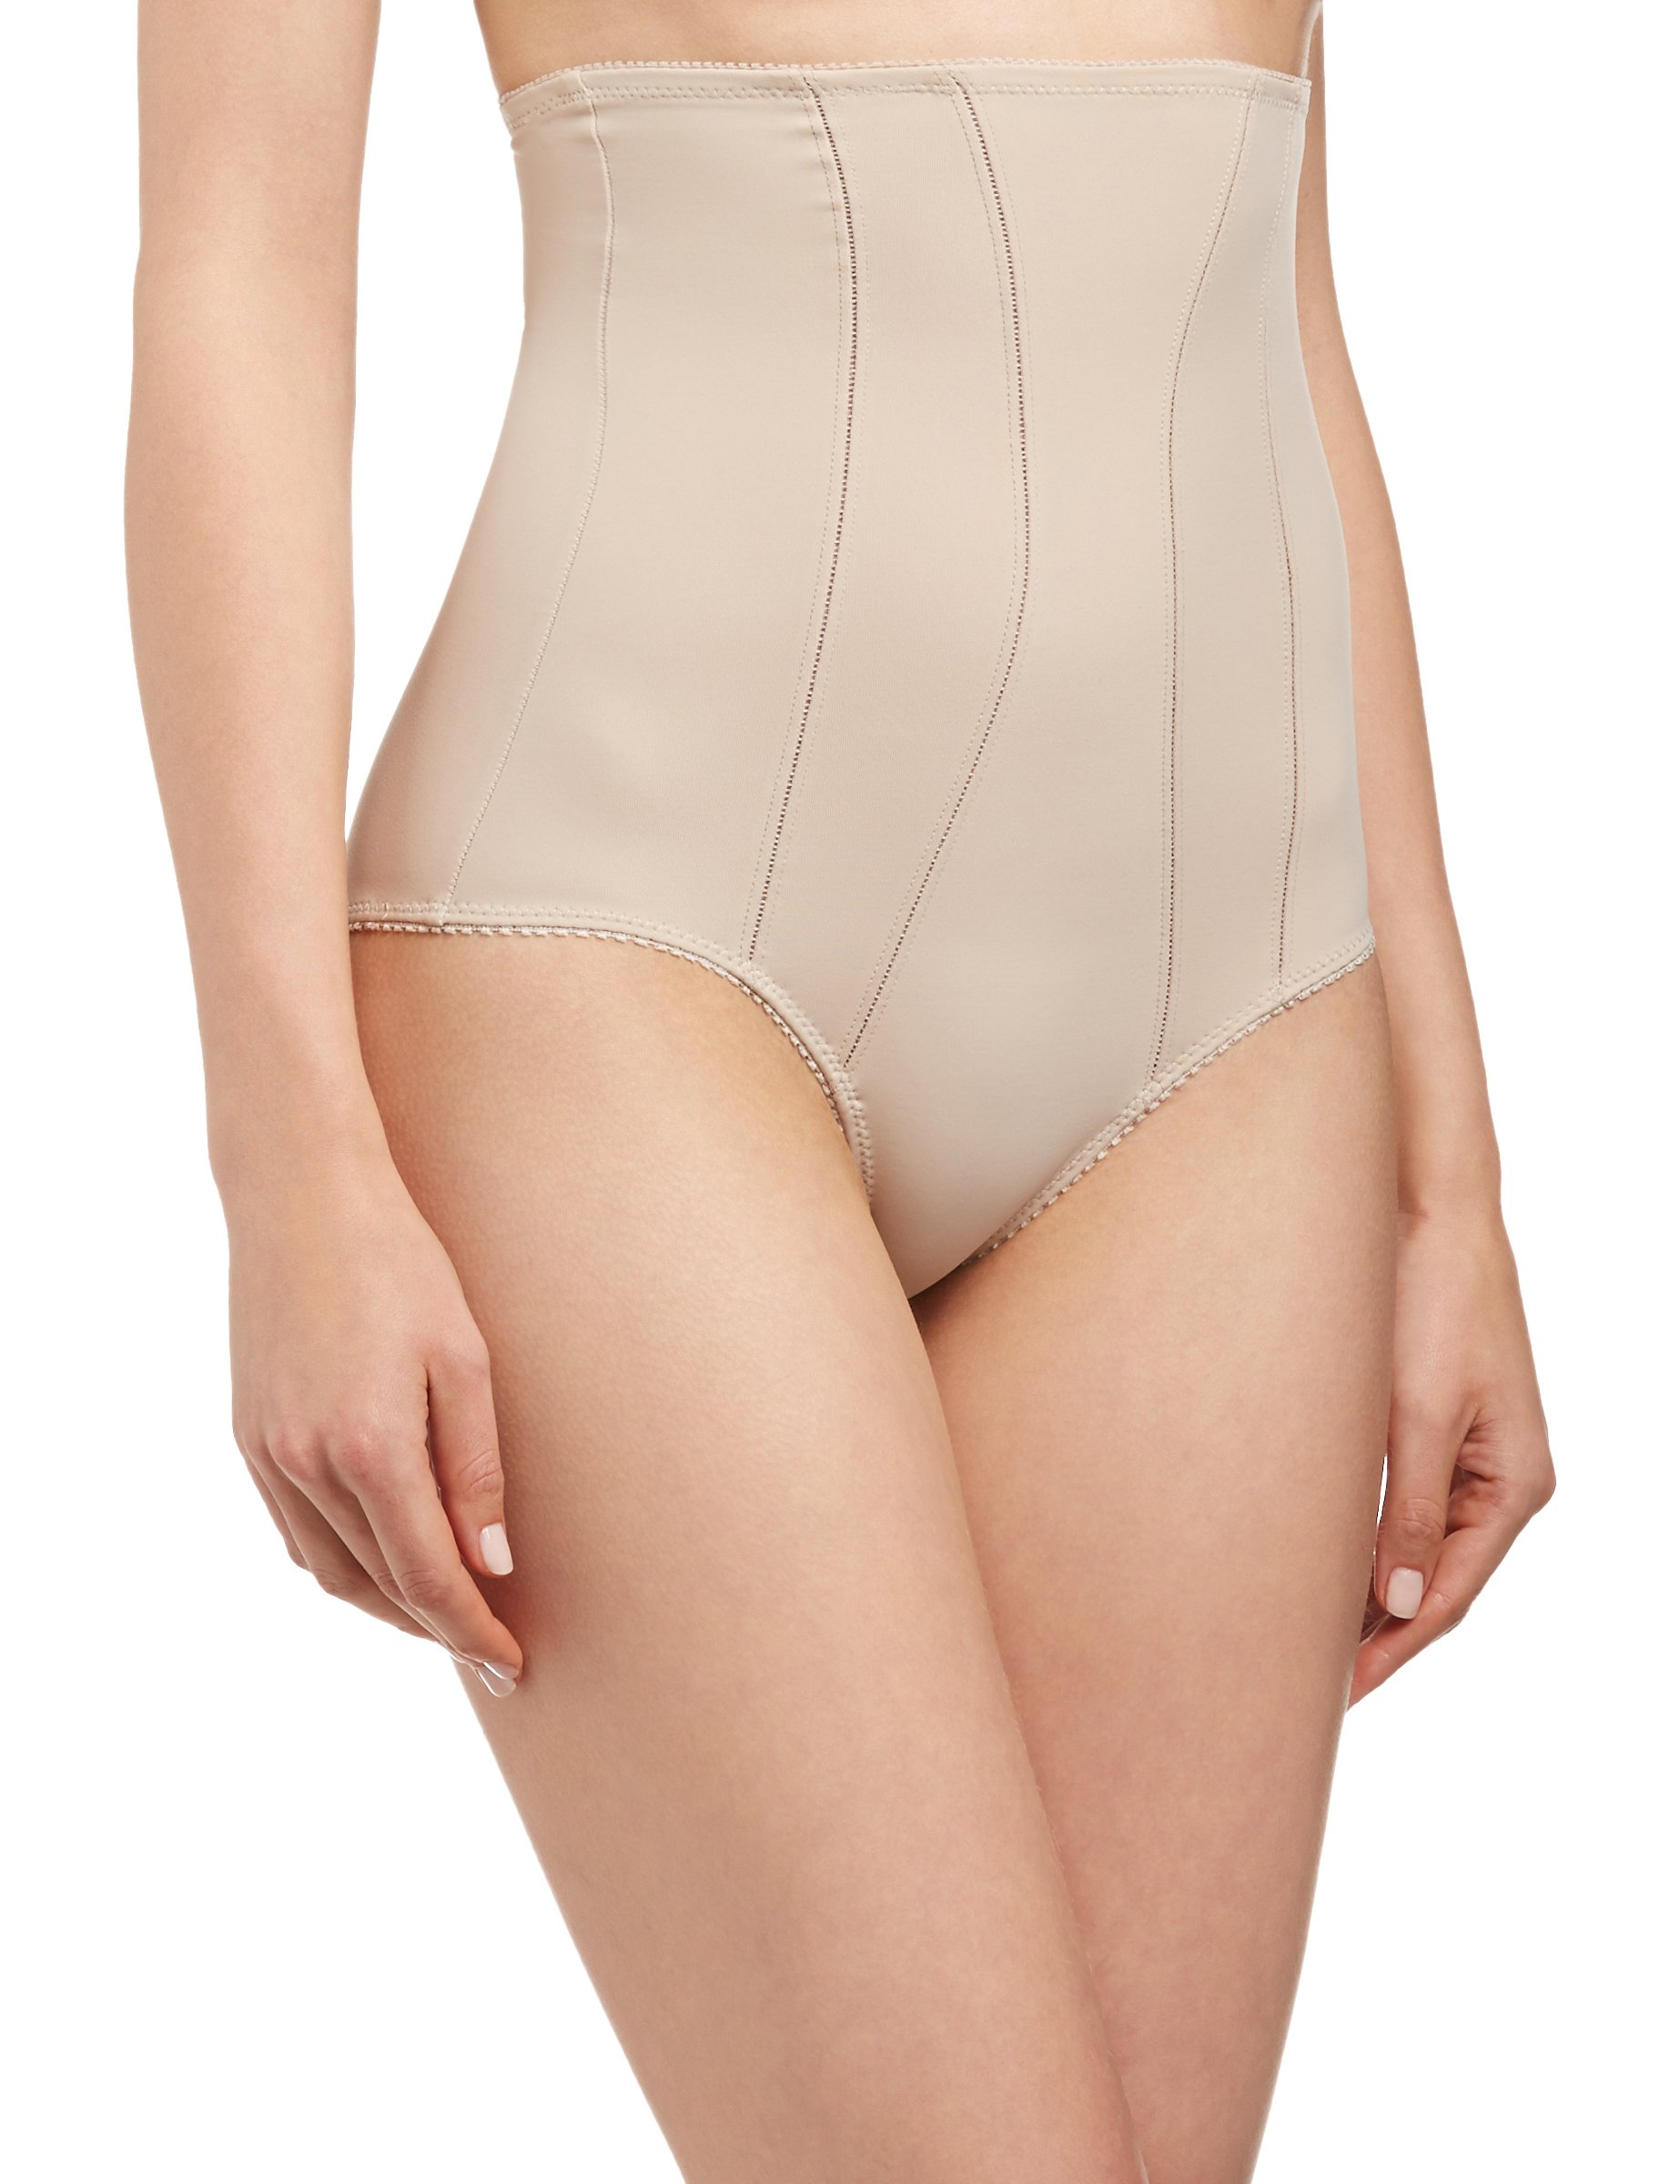 Naturana 女士高腰内裤绑腿塑形控制裤